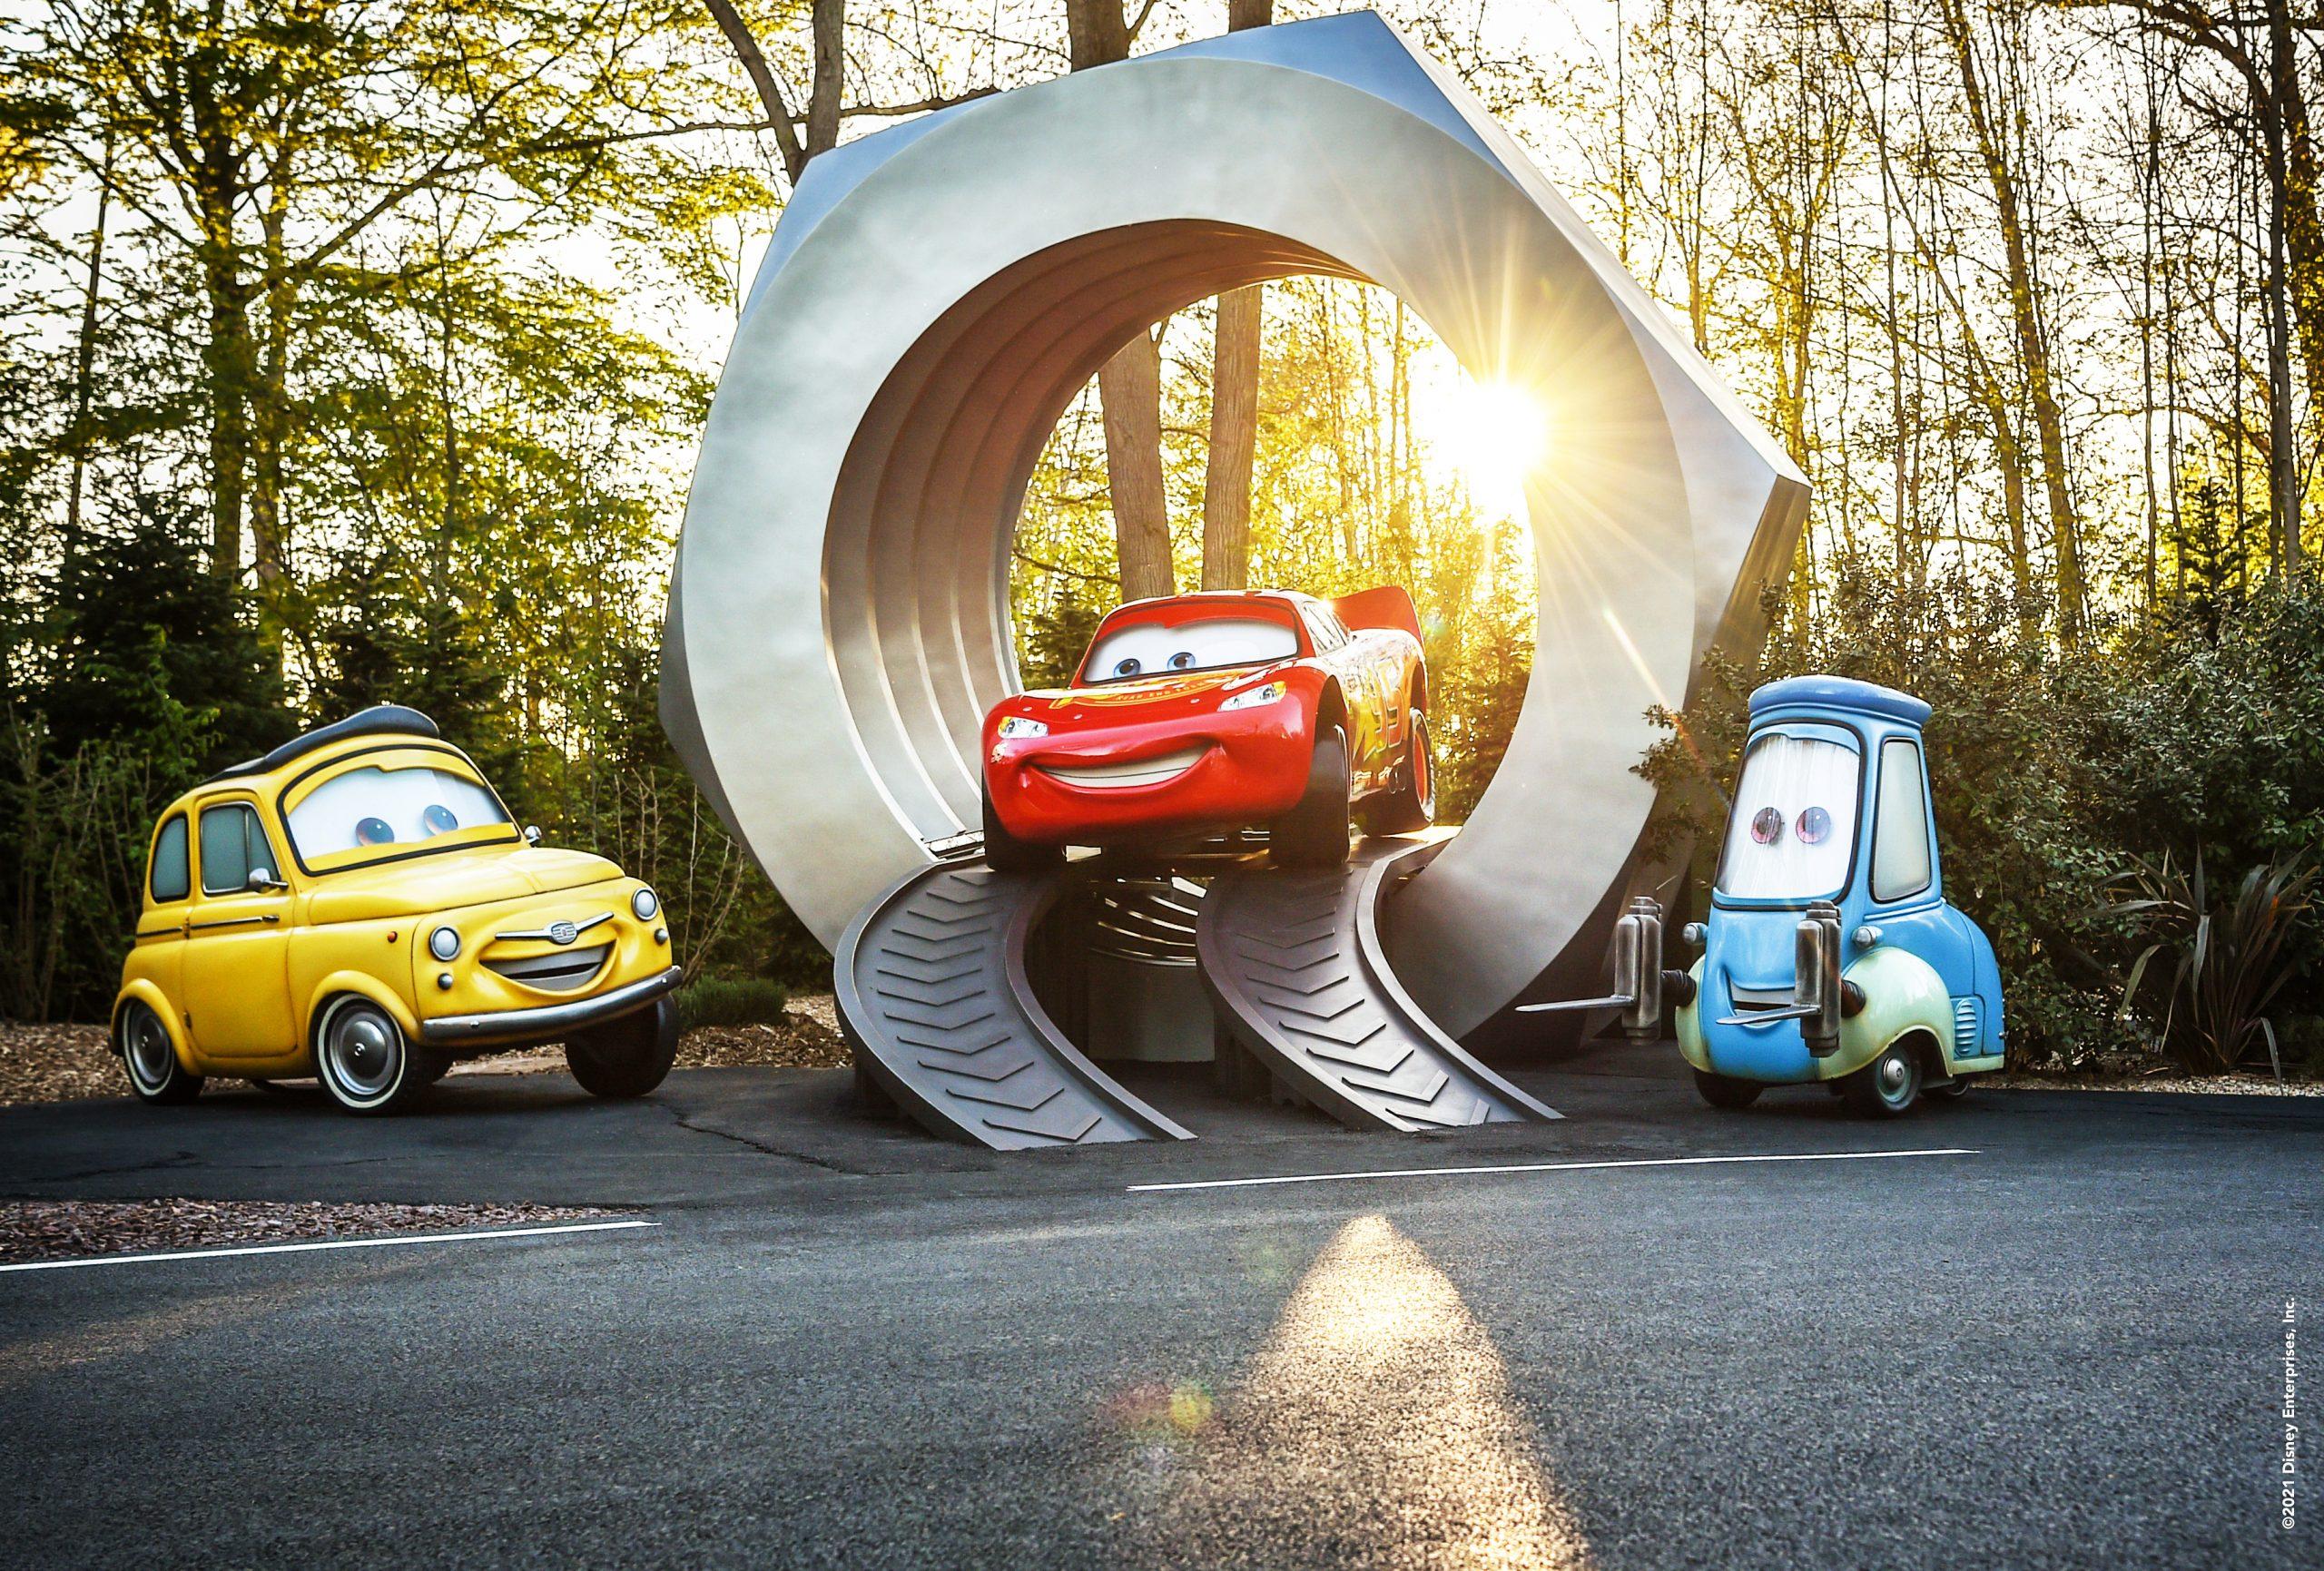 cars road trip nouvelle attraction disneyland paris 2021 walt disney studios